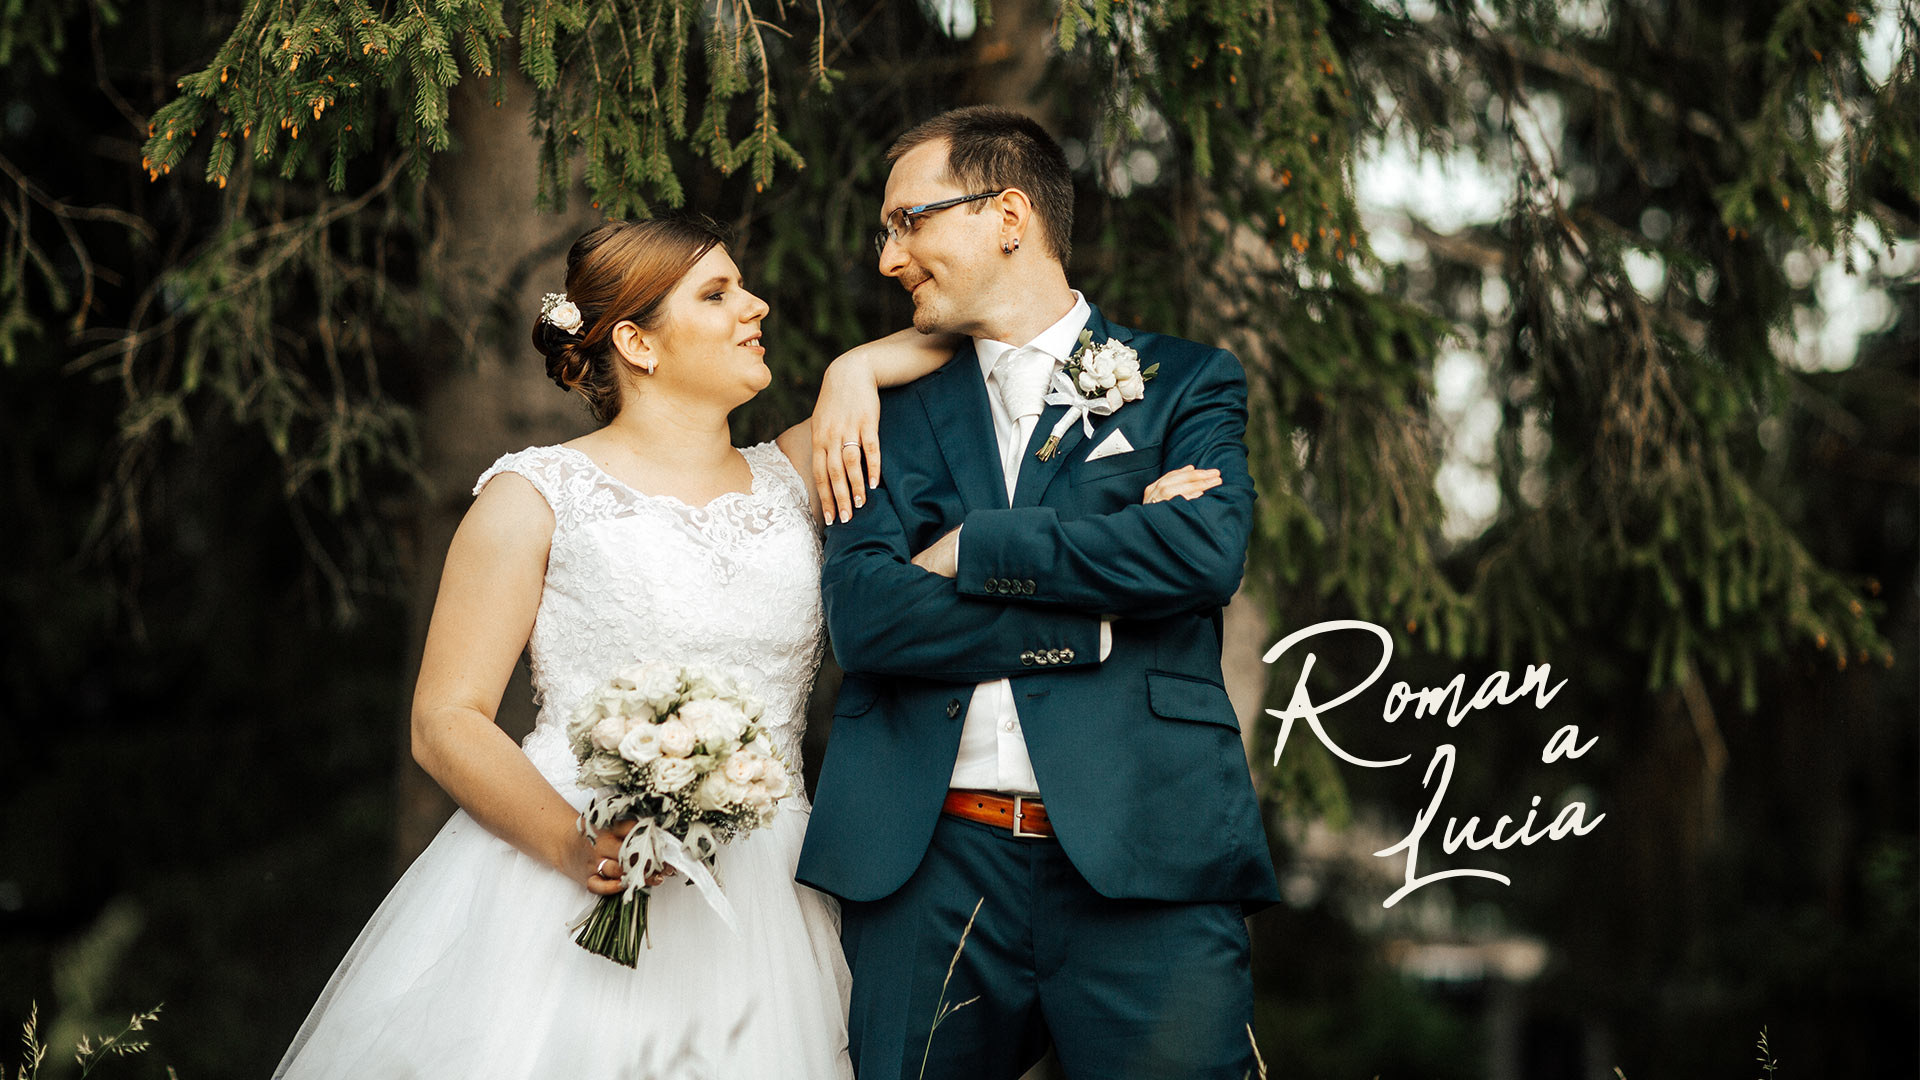 Svadba Lucia a Roman